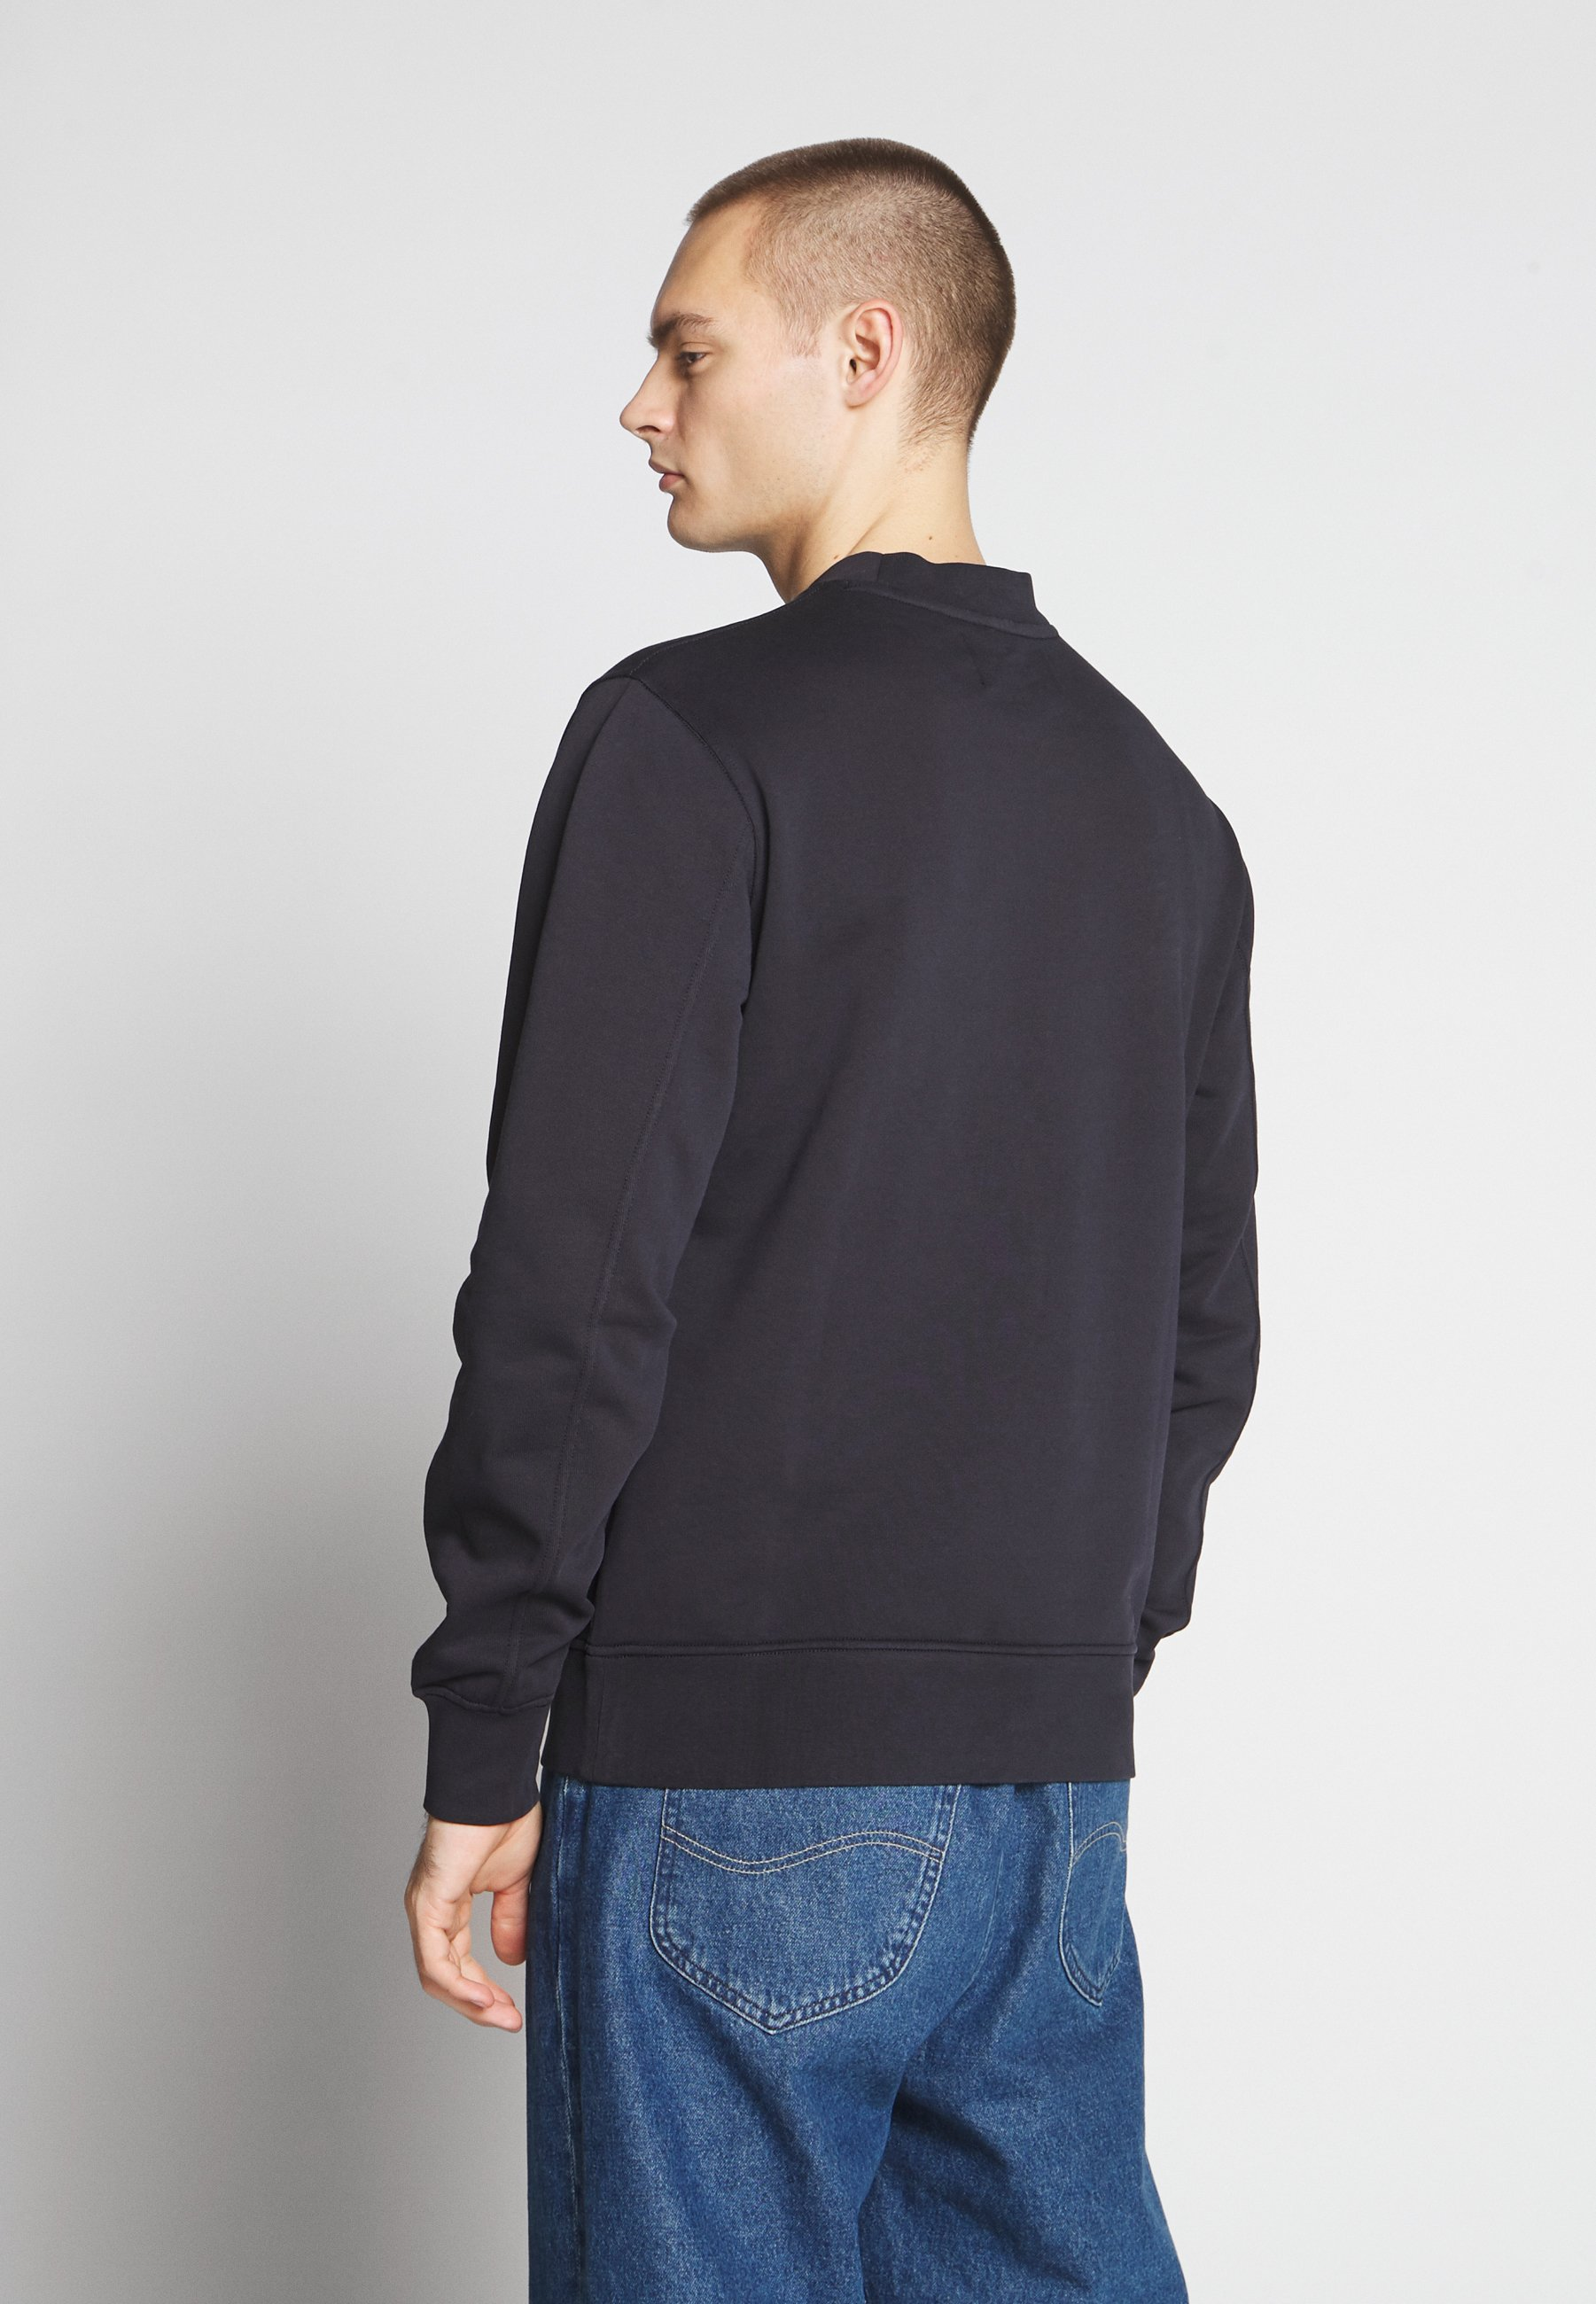 Virallinen Miesten vaatteet Sarja dfKJIUp97454sfGHYHD Calvin Klein Jeans INSTIT CHEST LOGO CREWNECK Collegepaita night sky